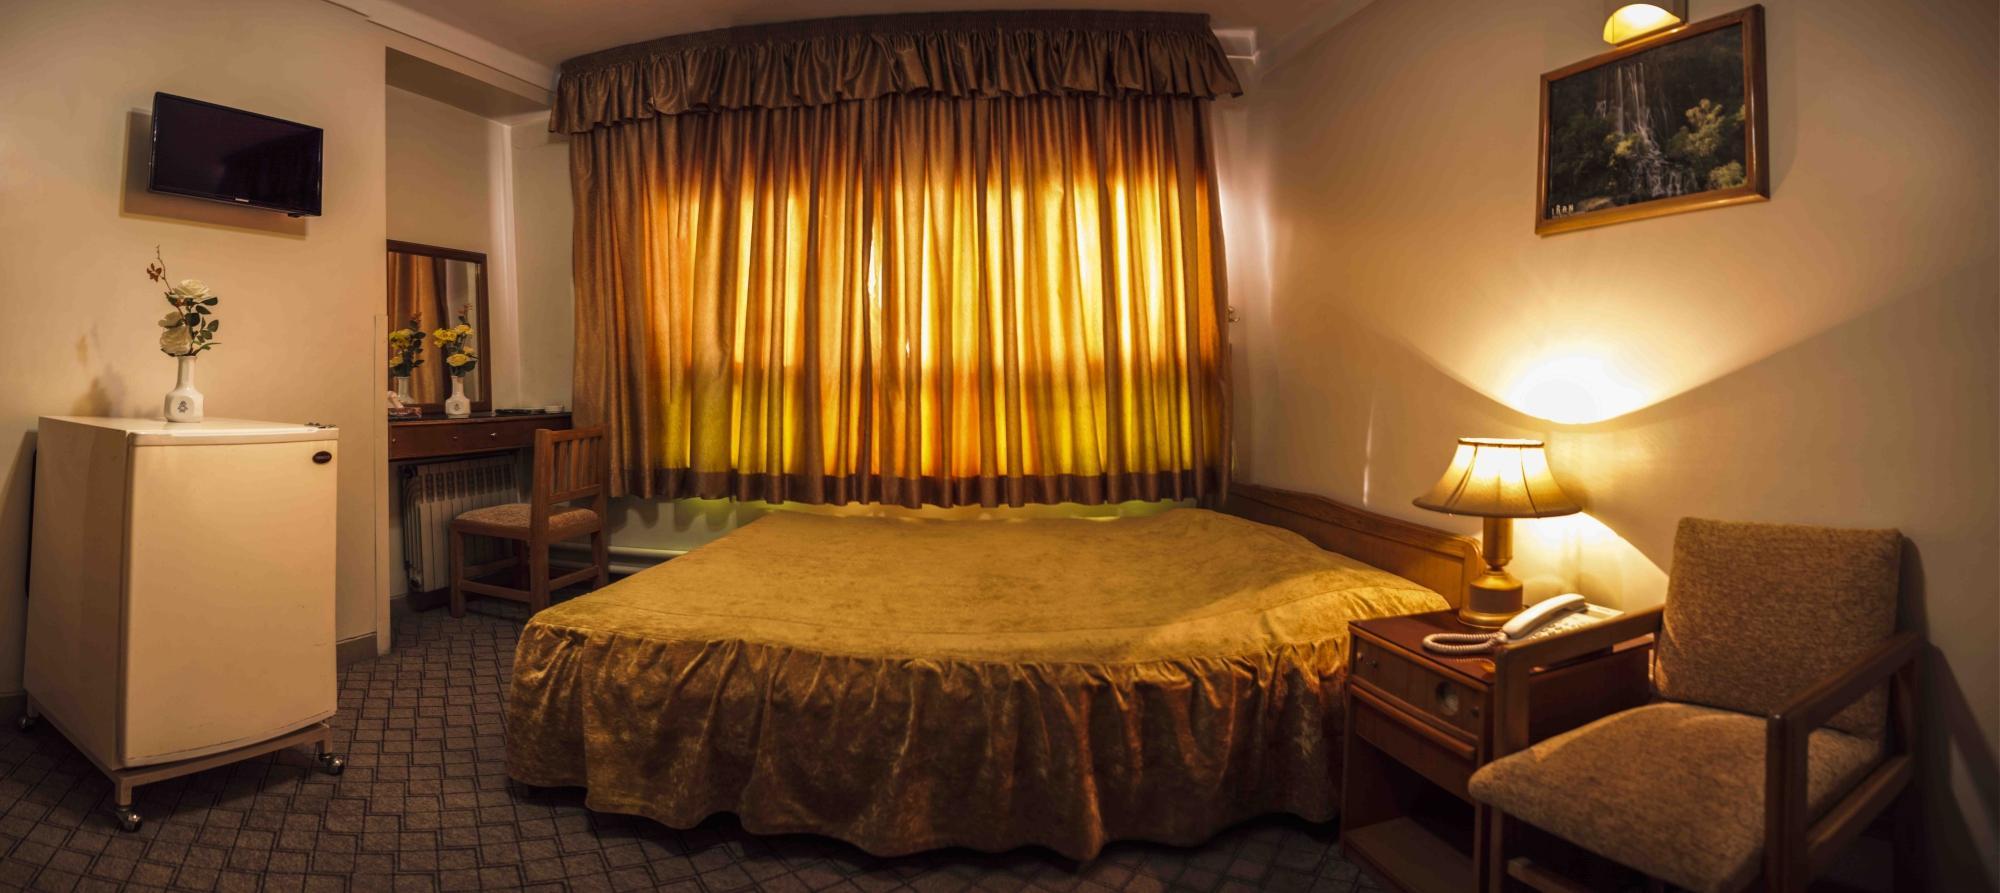 هتل ساسان شیراز3